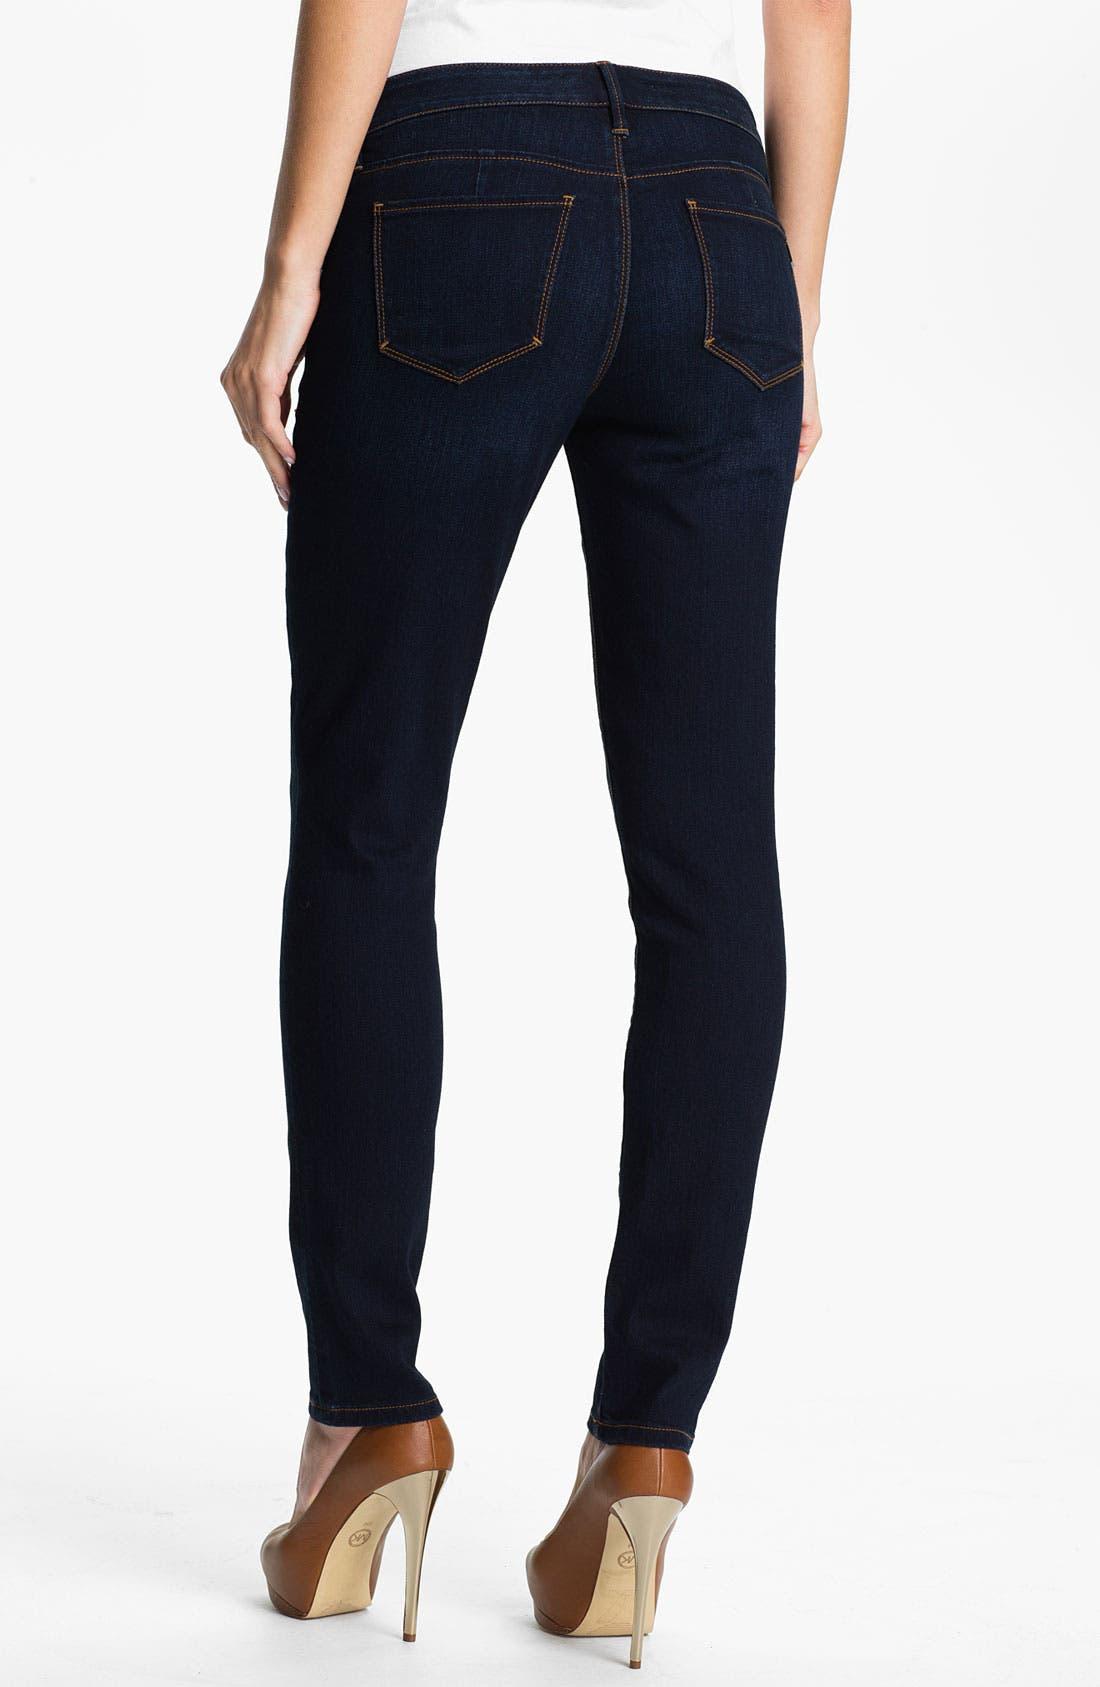 Alternate Image 2  - Isaac Mizrahi Jeans 'Samantha' Skinny Jeans (Madison)